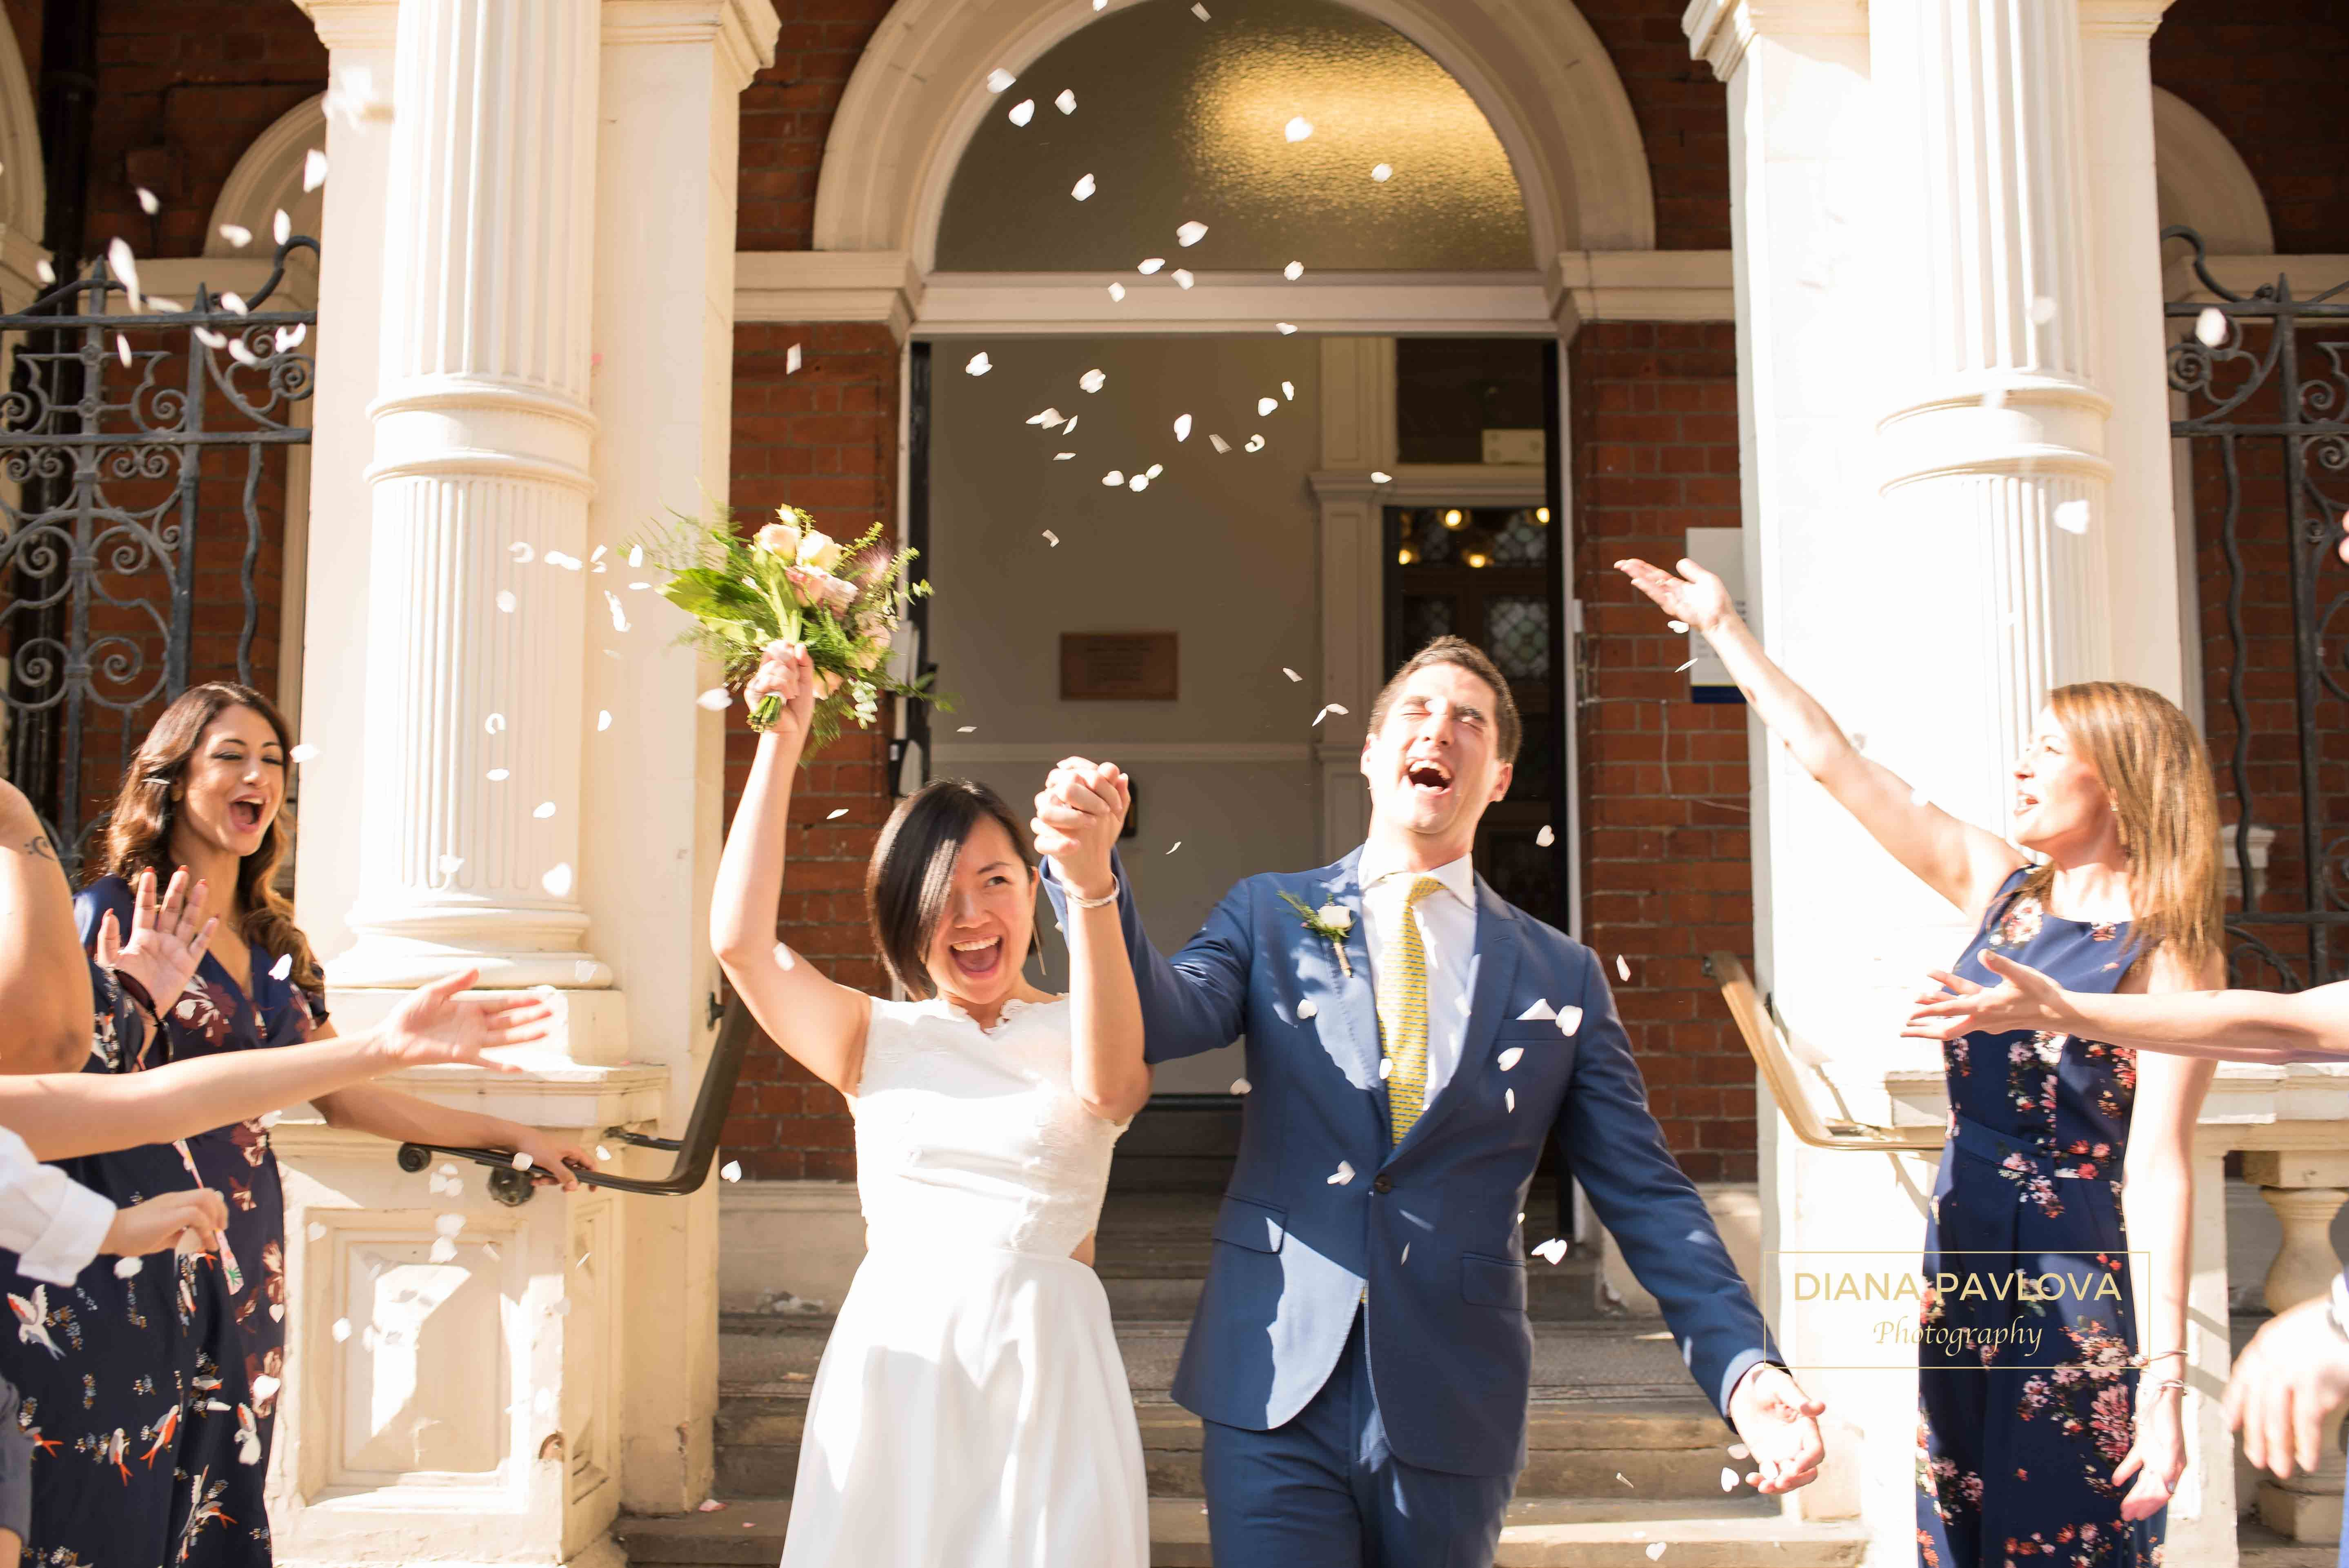 Civil Ceremony At Mayfair Library London Wedding Photography By Diana Pavlova